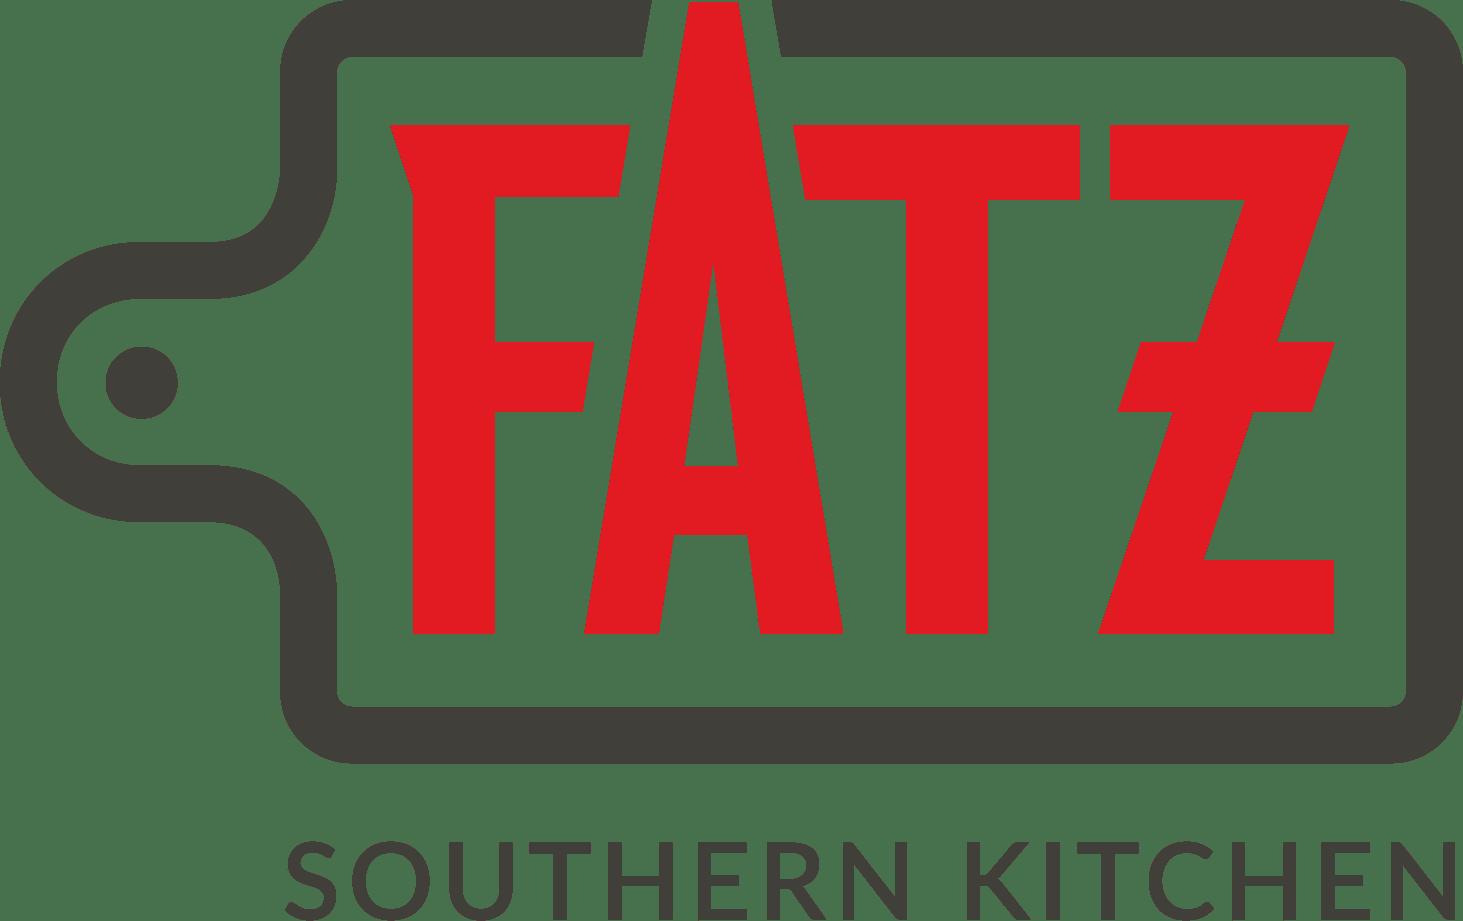 Screenshot of the Fatz Southern Kitchen logo